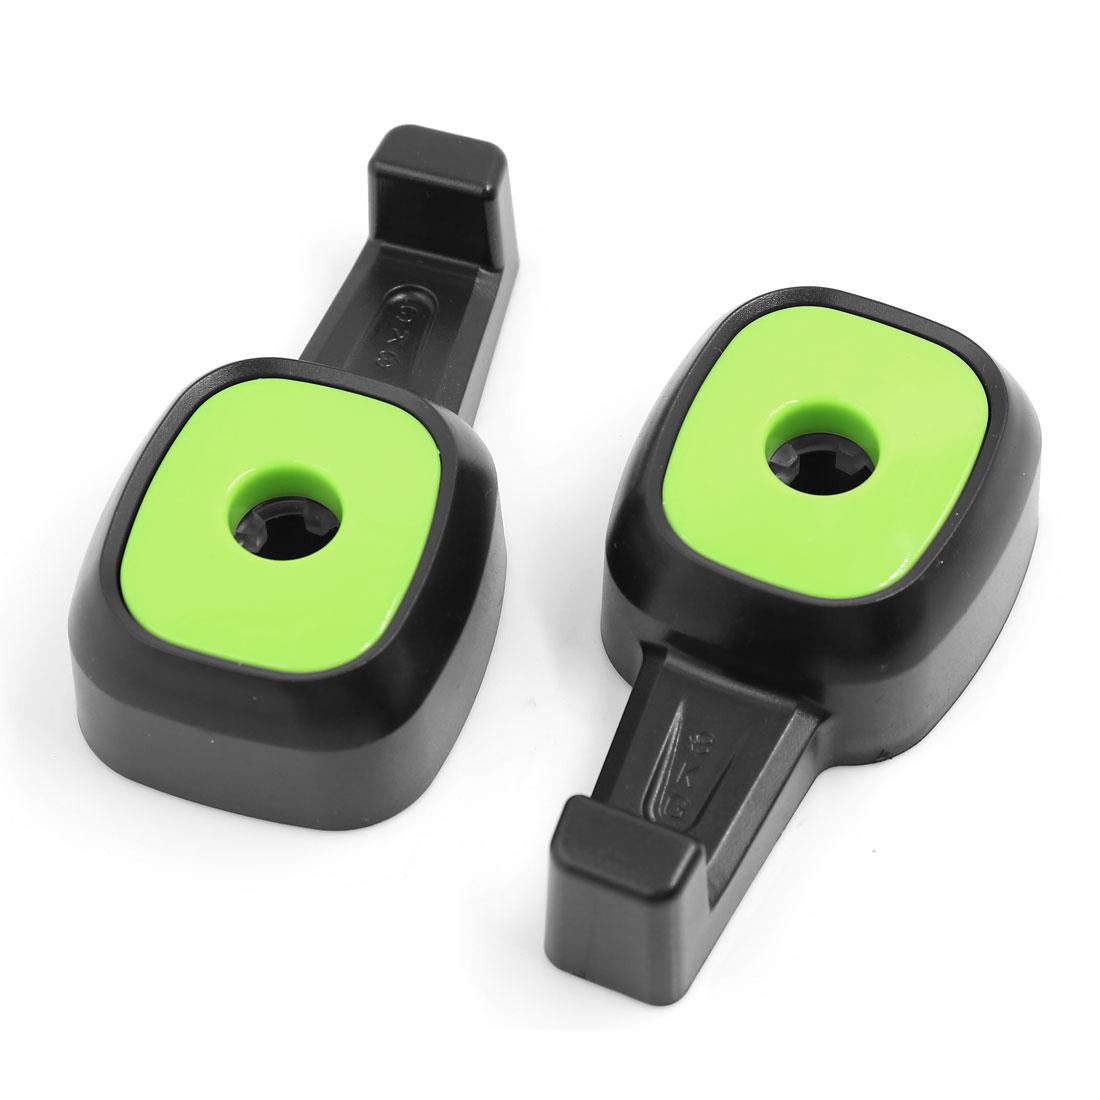 Car SUV Seat Headrest Hanger Holder Purse Bag Hook Organizer Black Green 2 Pcs